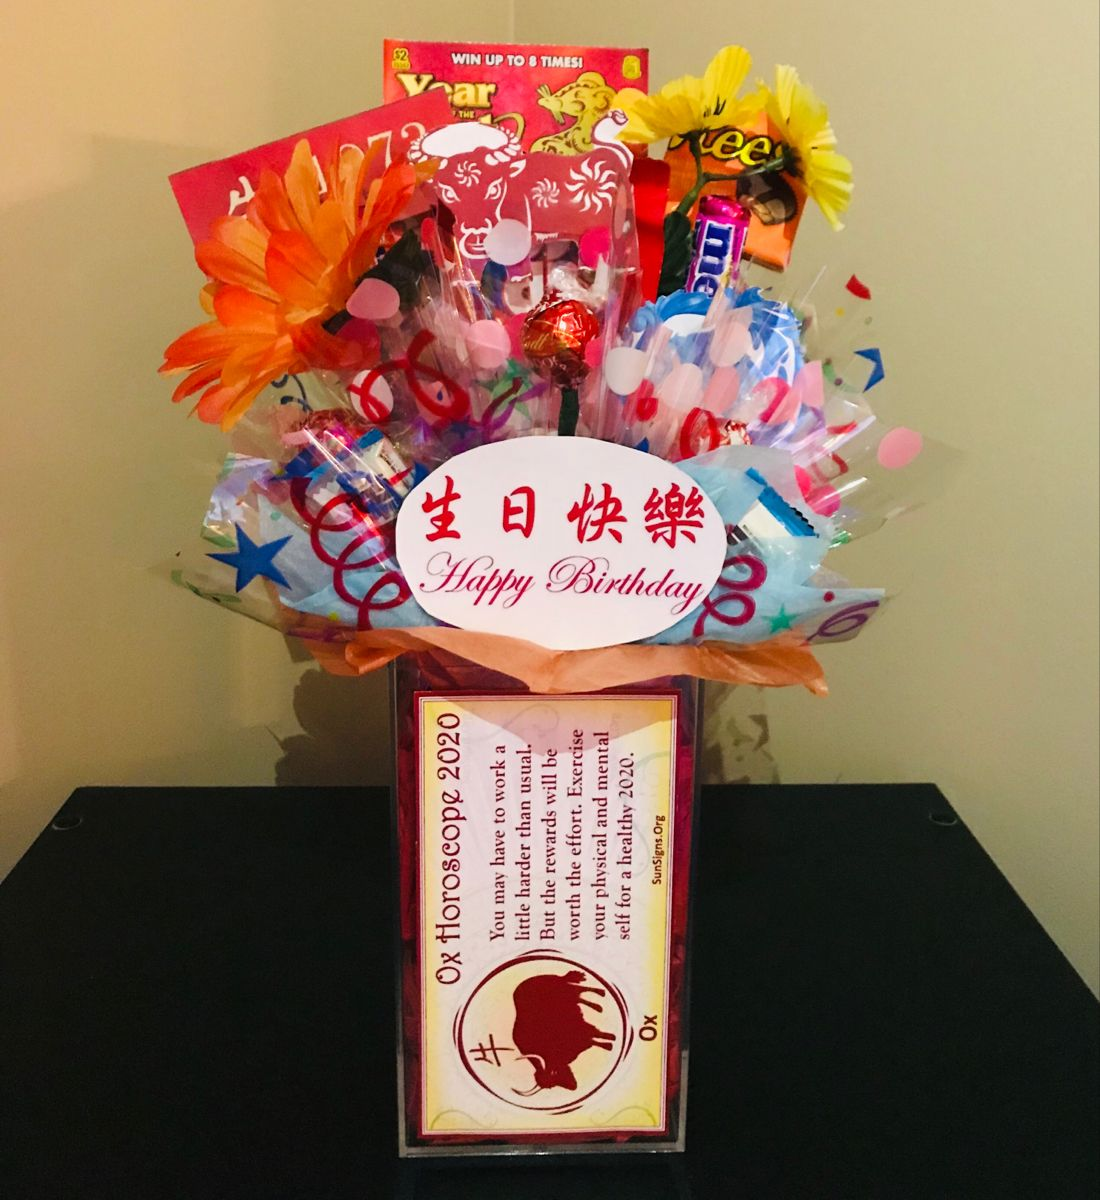 Happy Birthday with a Red Birthday Balloon Birthday